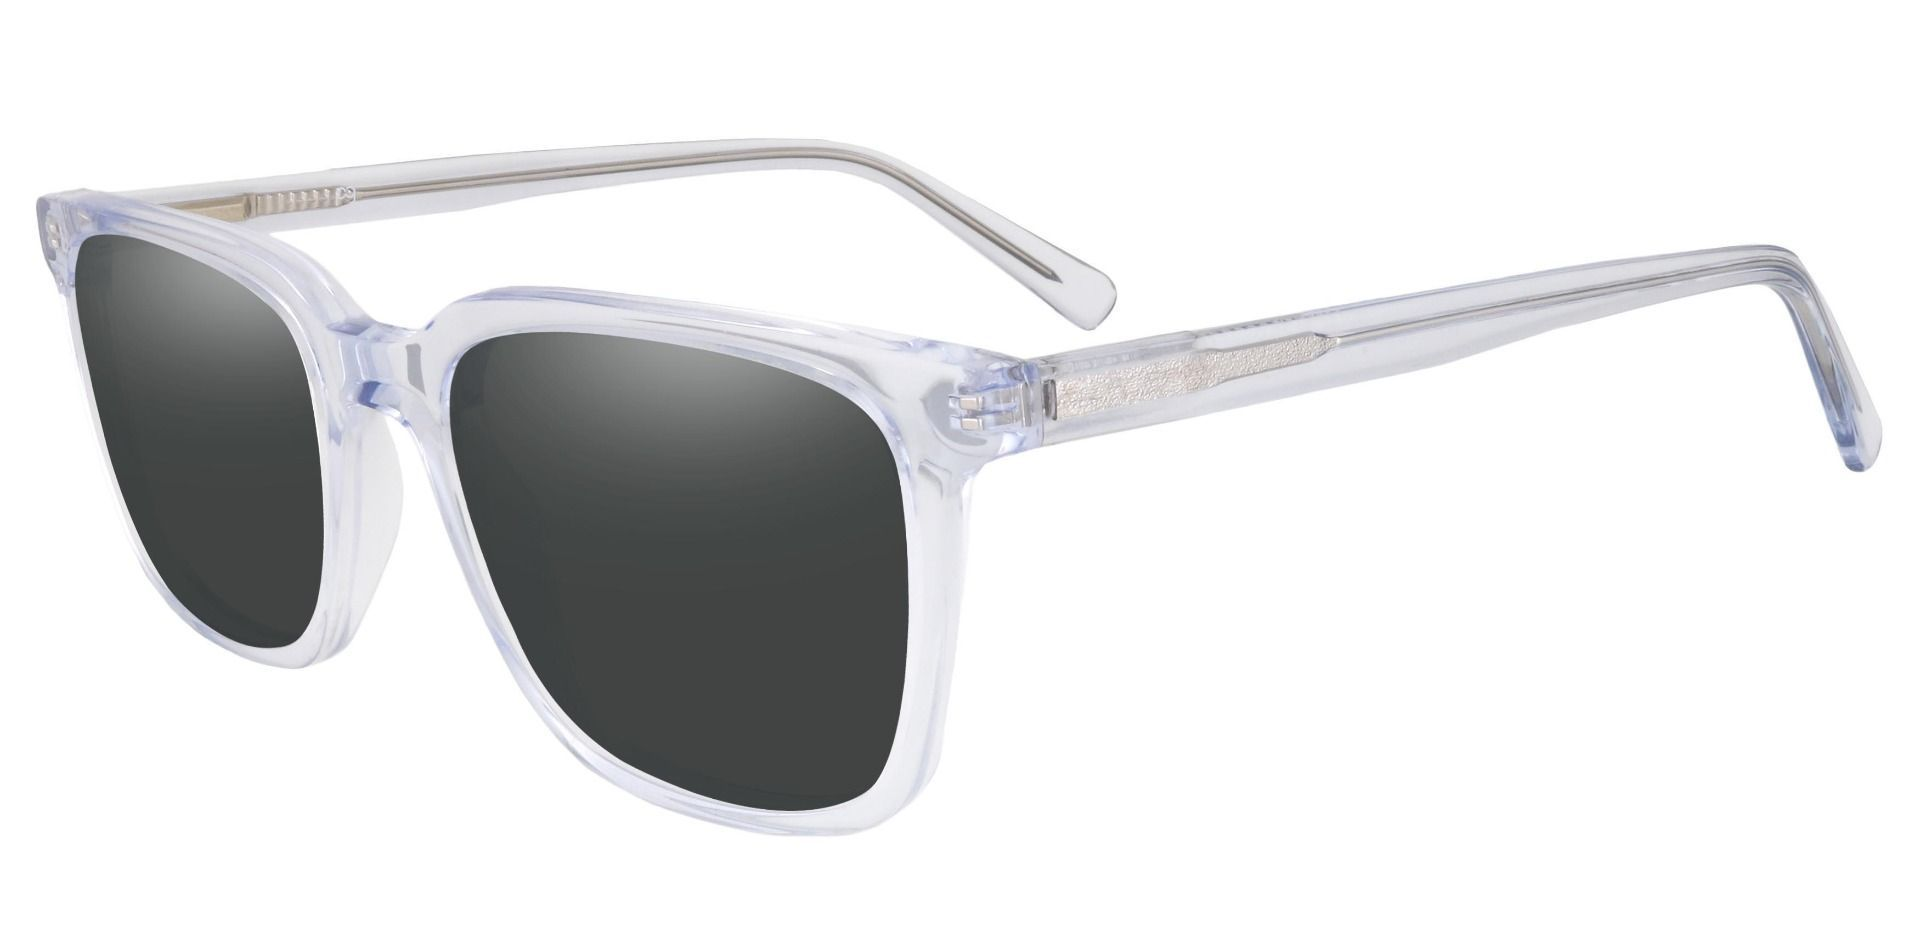 Alex Square Prescription Sunglasses - Clear Frame With Gray Lenses